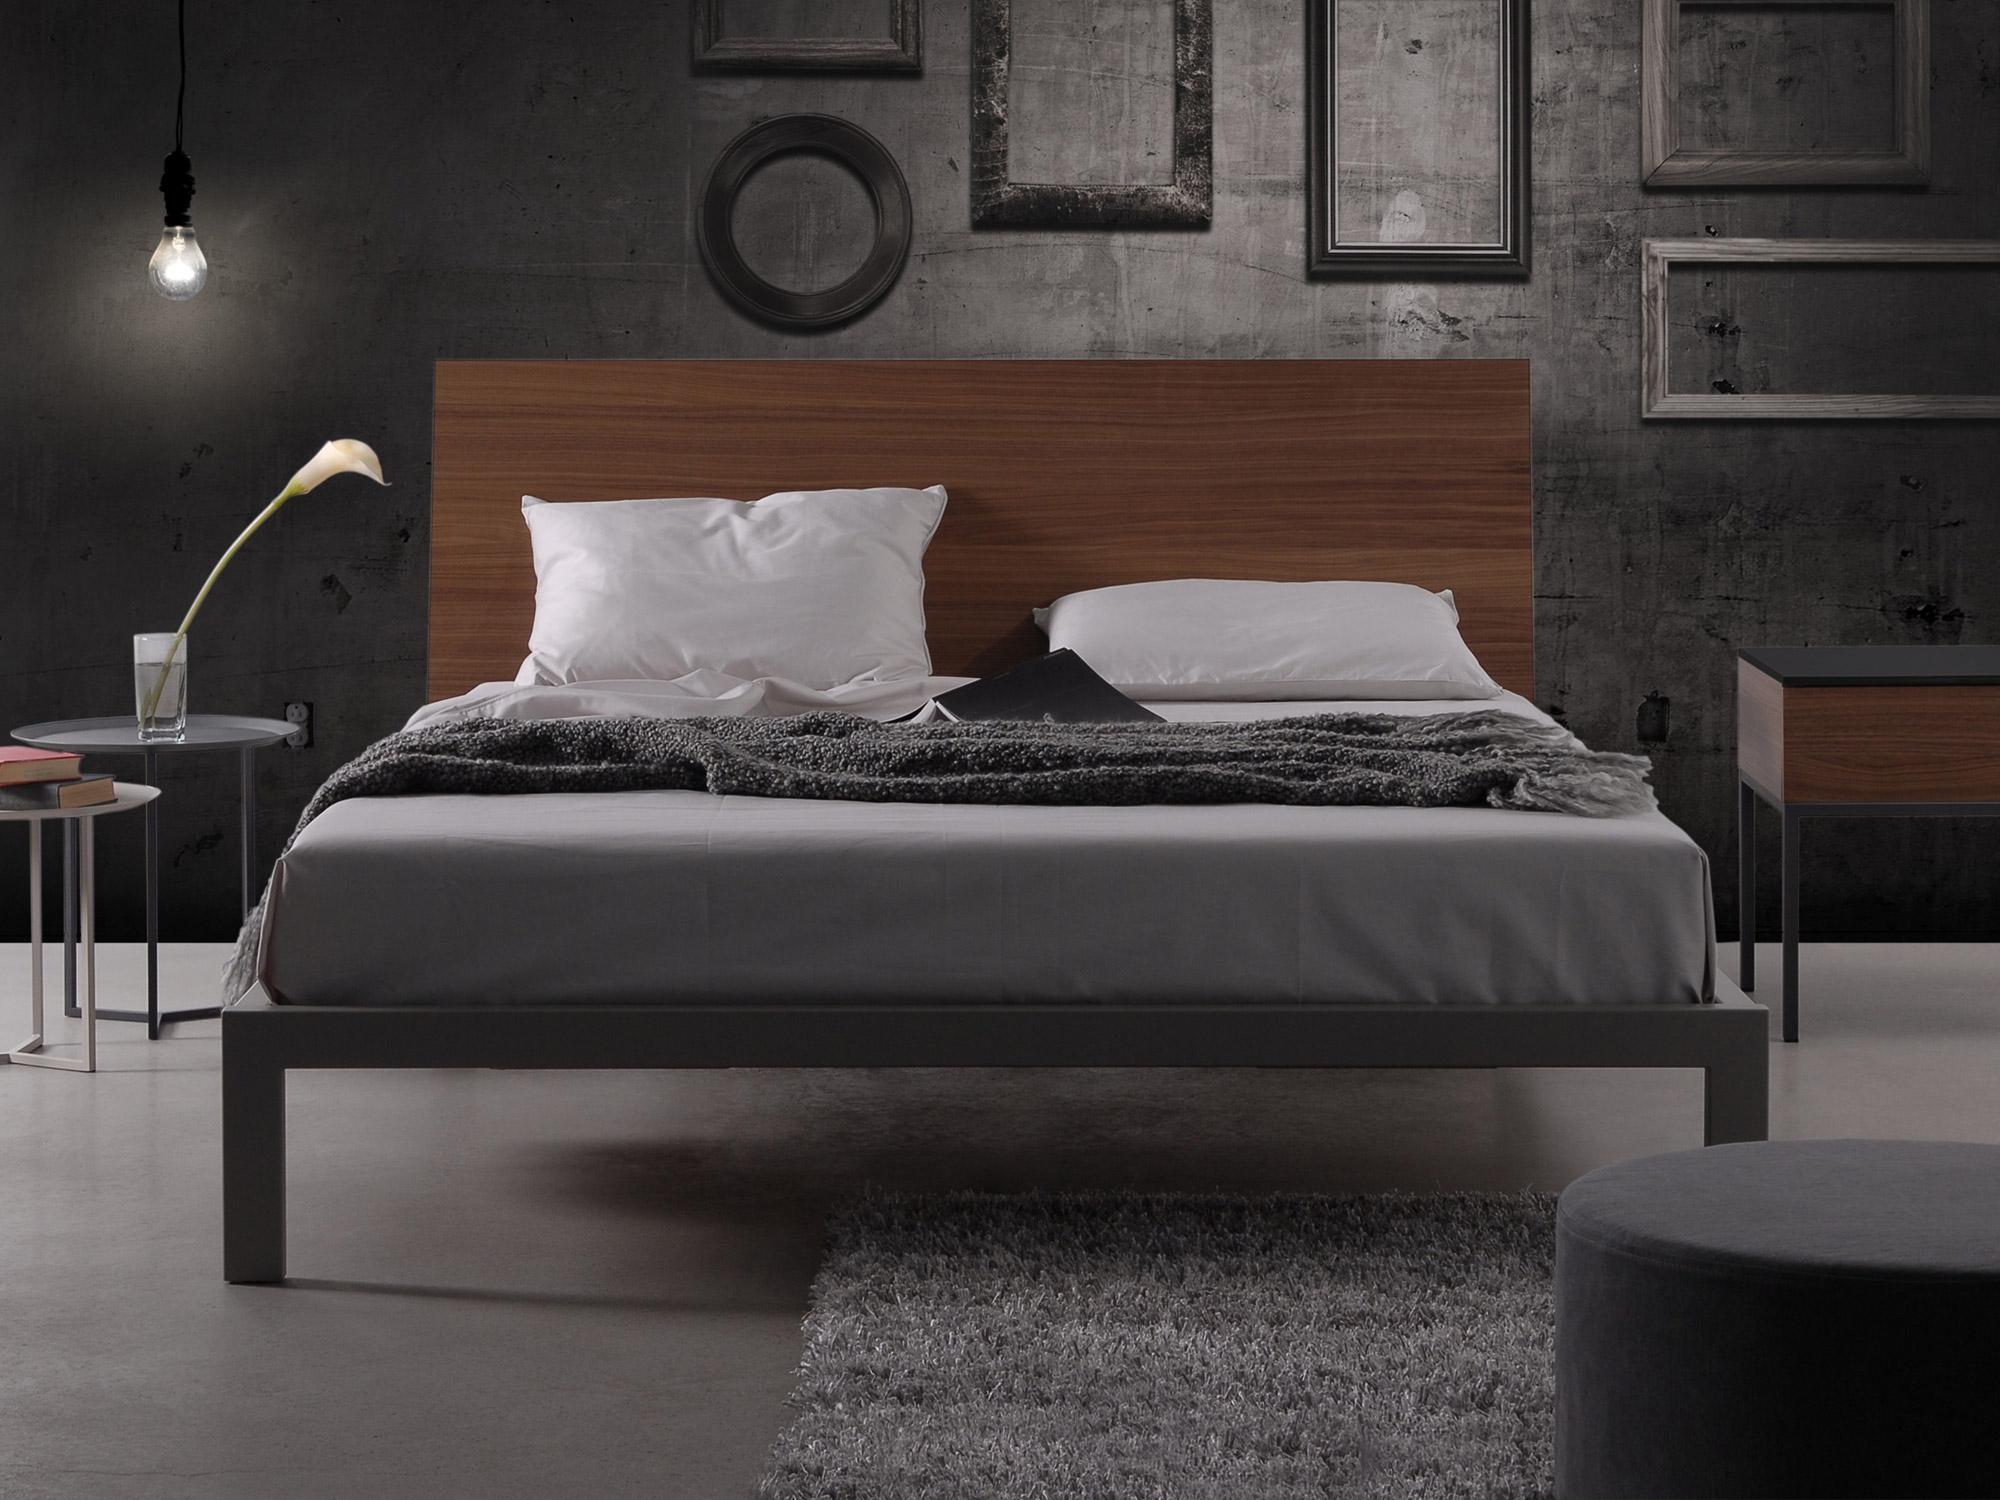 Trica City Bed.jpg